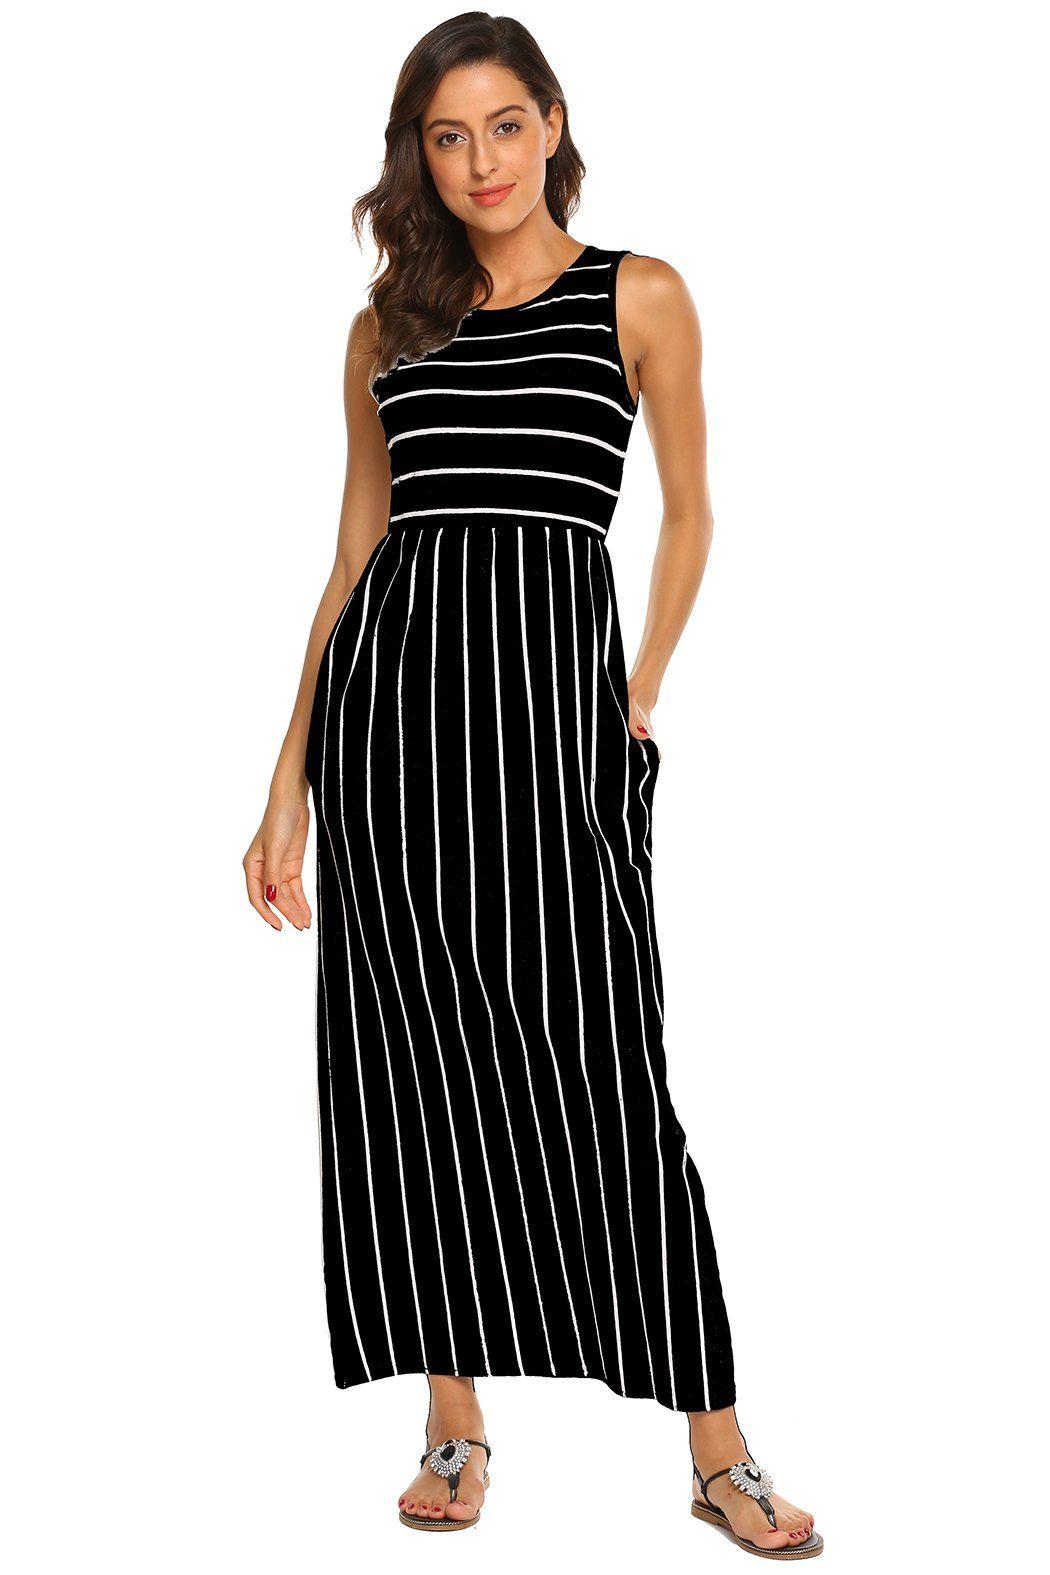 Womens Sleeveless Round Neck Striped Tank Maxi Dress With Pockets Black Large Click On The Image For Additional Long Maxi Dress Maxi Dress Maxi Tank Dress [ 1575 x 1050 Pixel ]